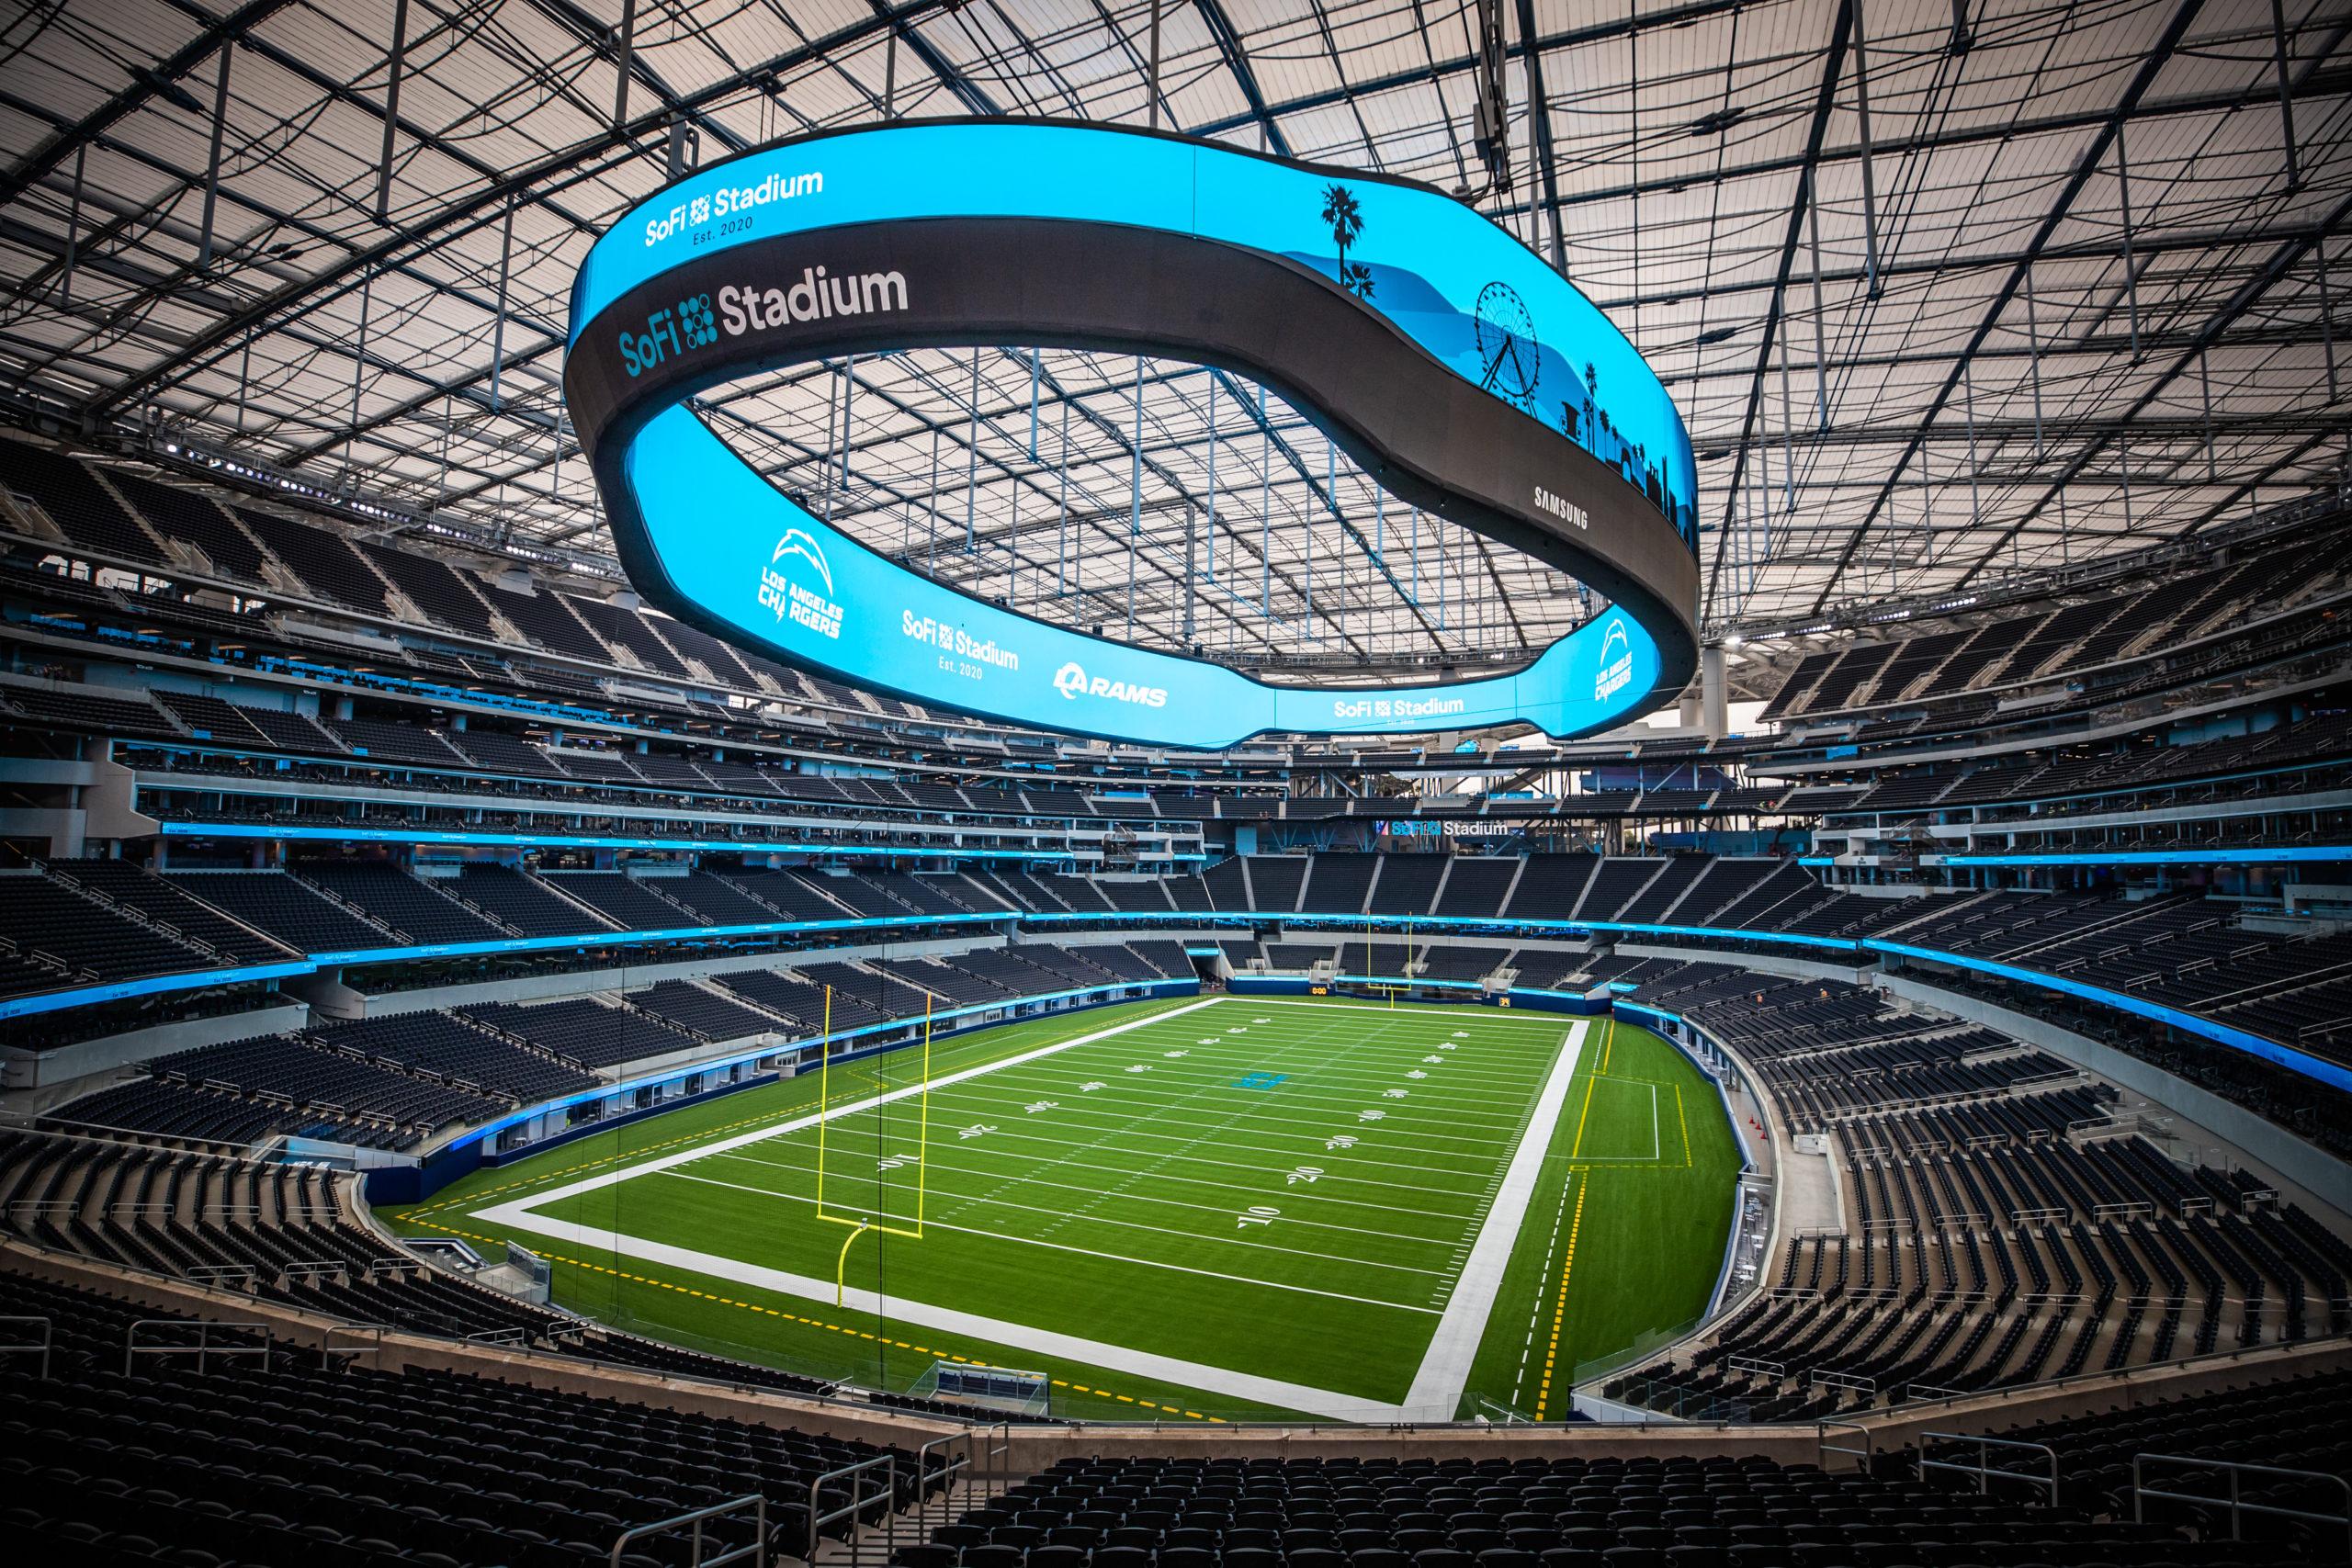 SoFi Stadium video board 4K